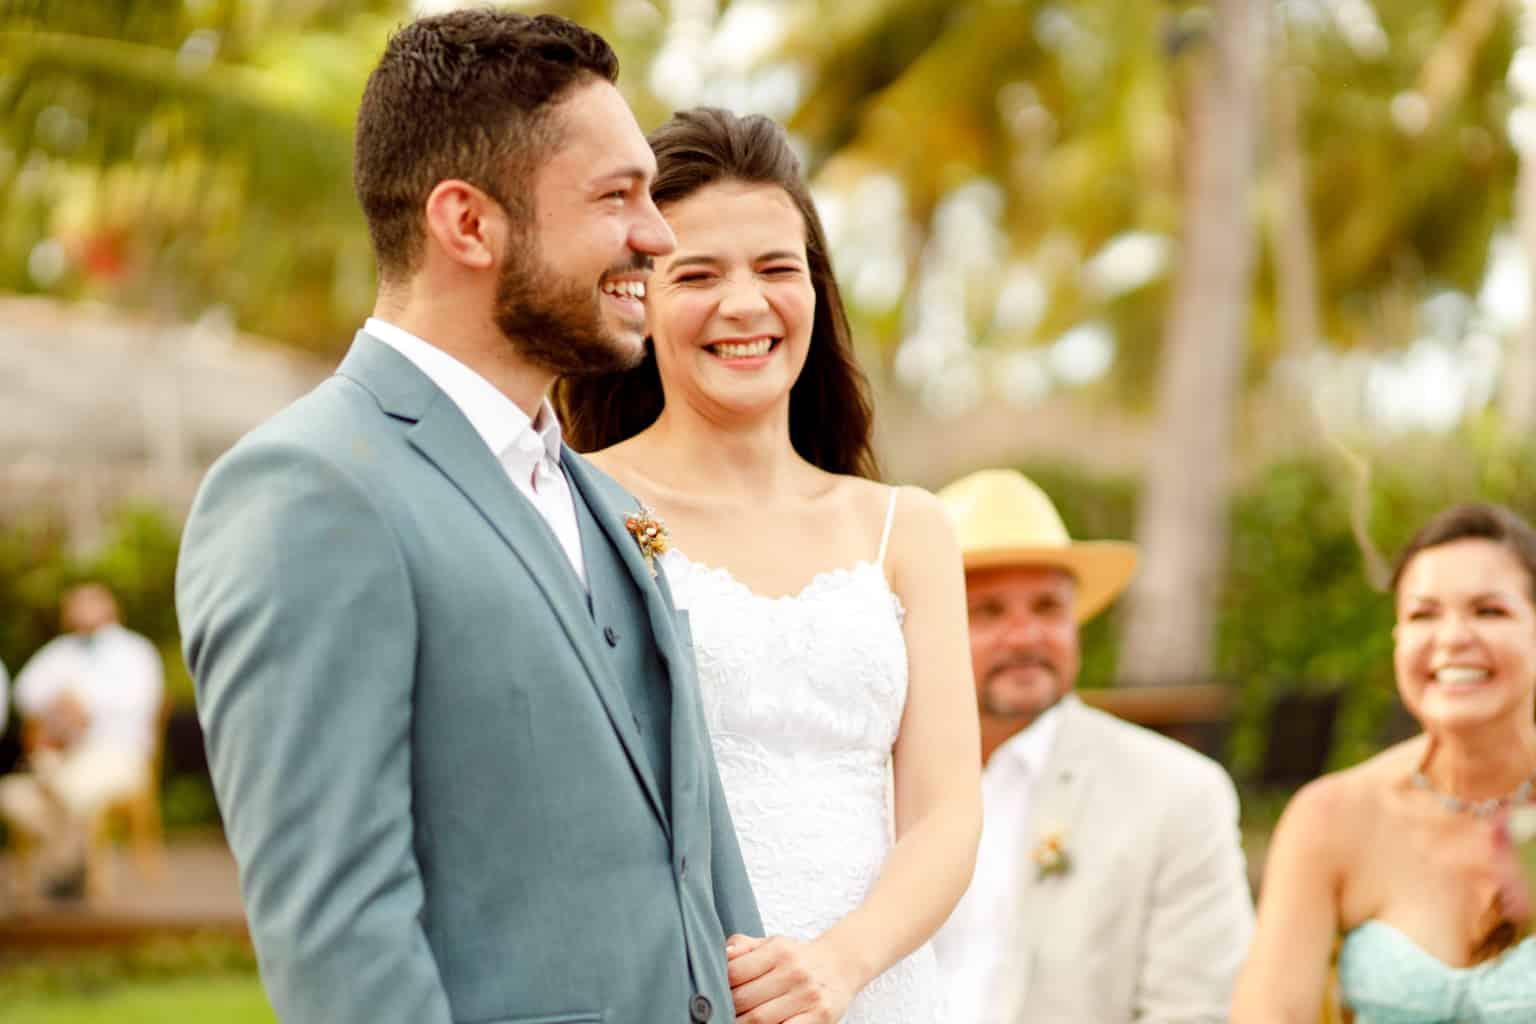 Casamento-Emanuelle-e-Alysson-Fotografia-Tadeu-Nanó-e-Luca-Antunes92